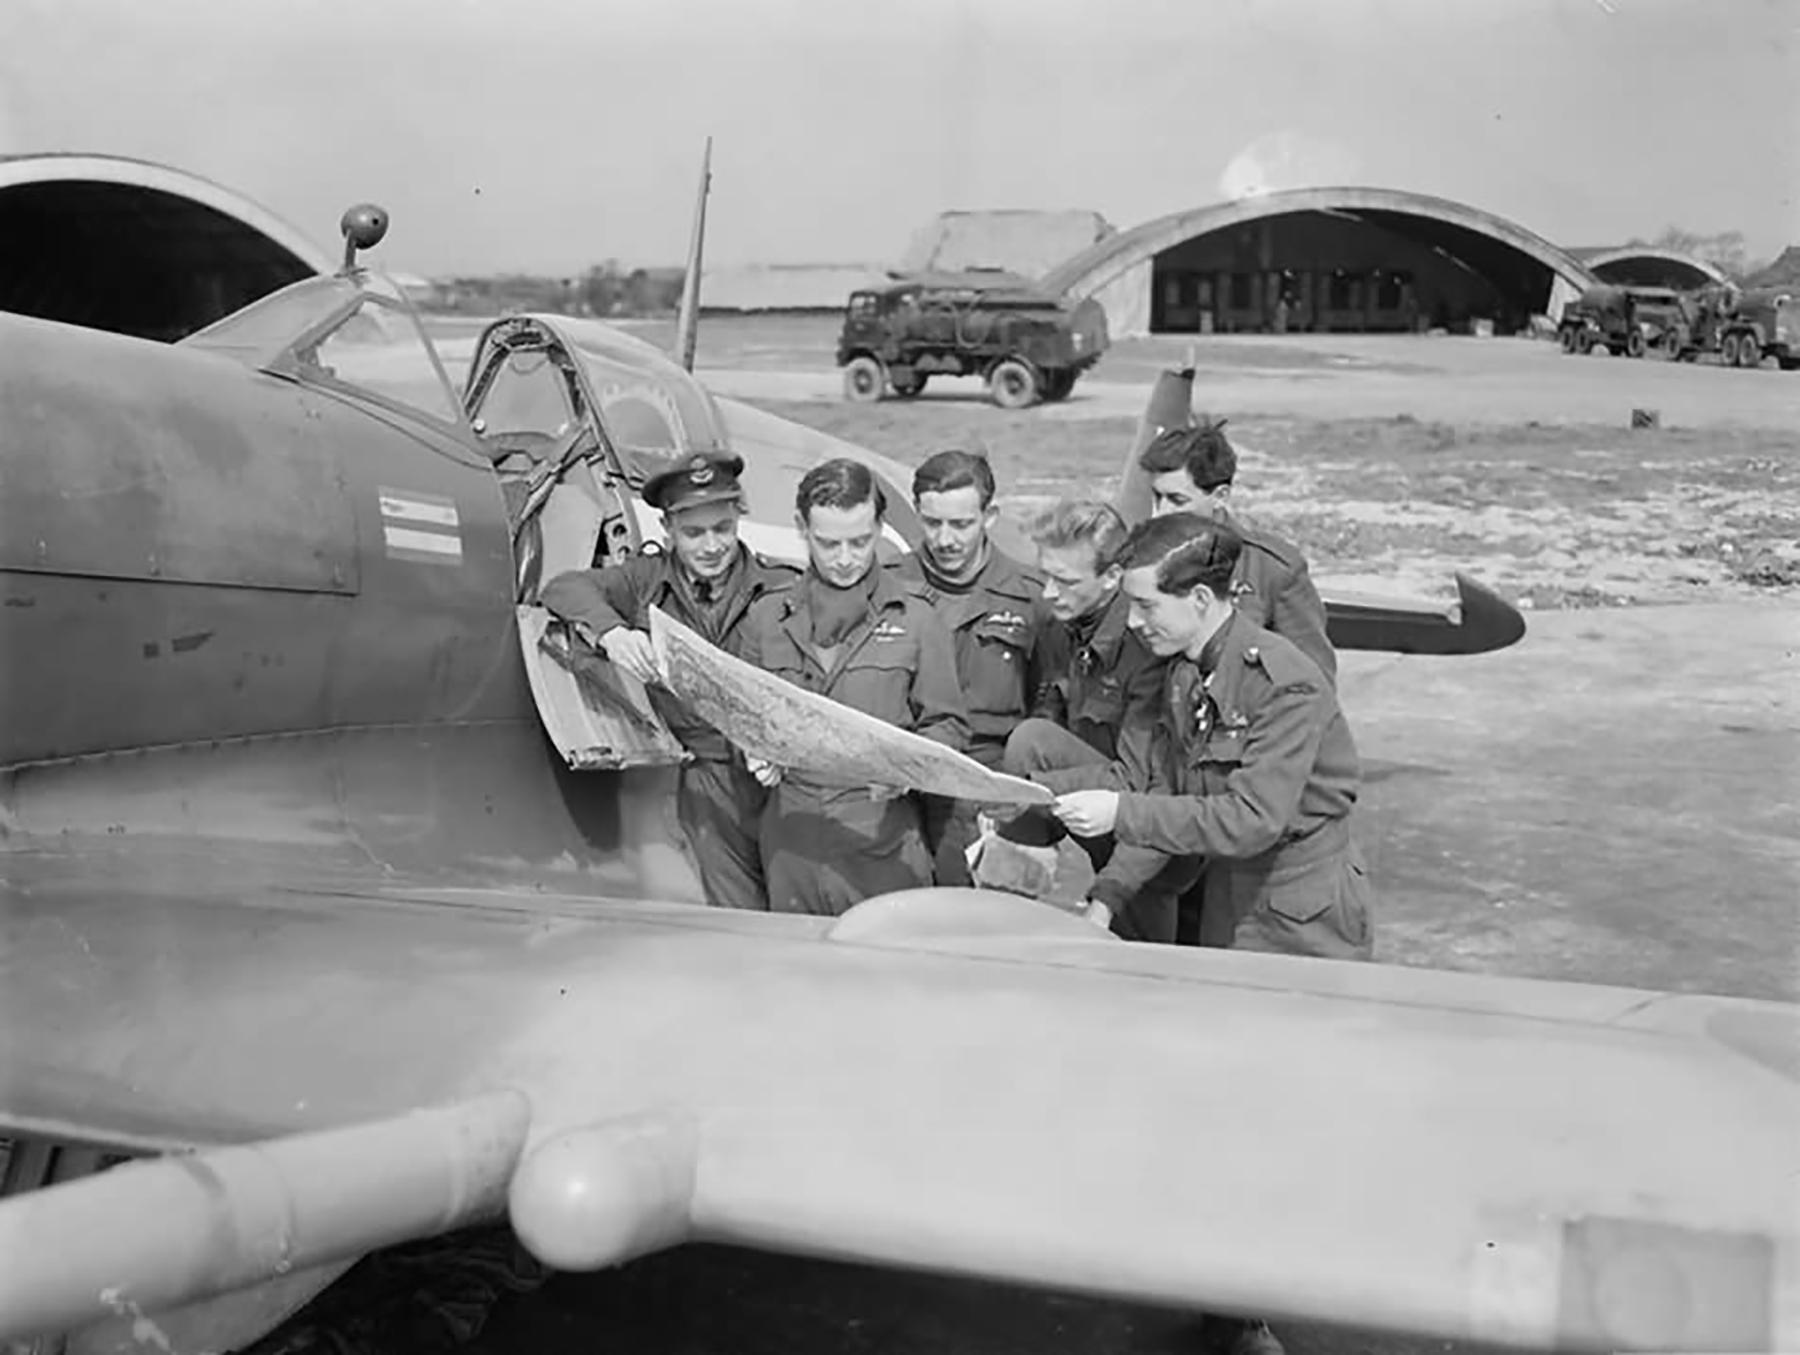 Spitfire LFIX RAF 132Sqn SqnLdr Alan Page at Ford 27th Apr 1944 01